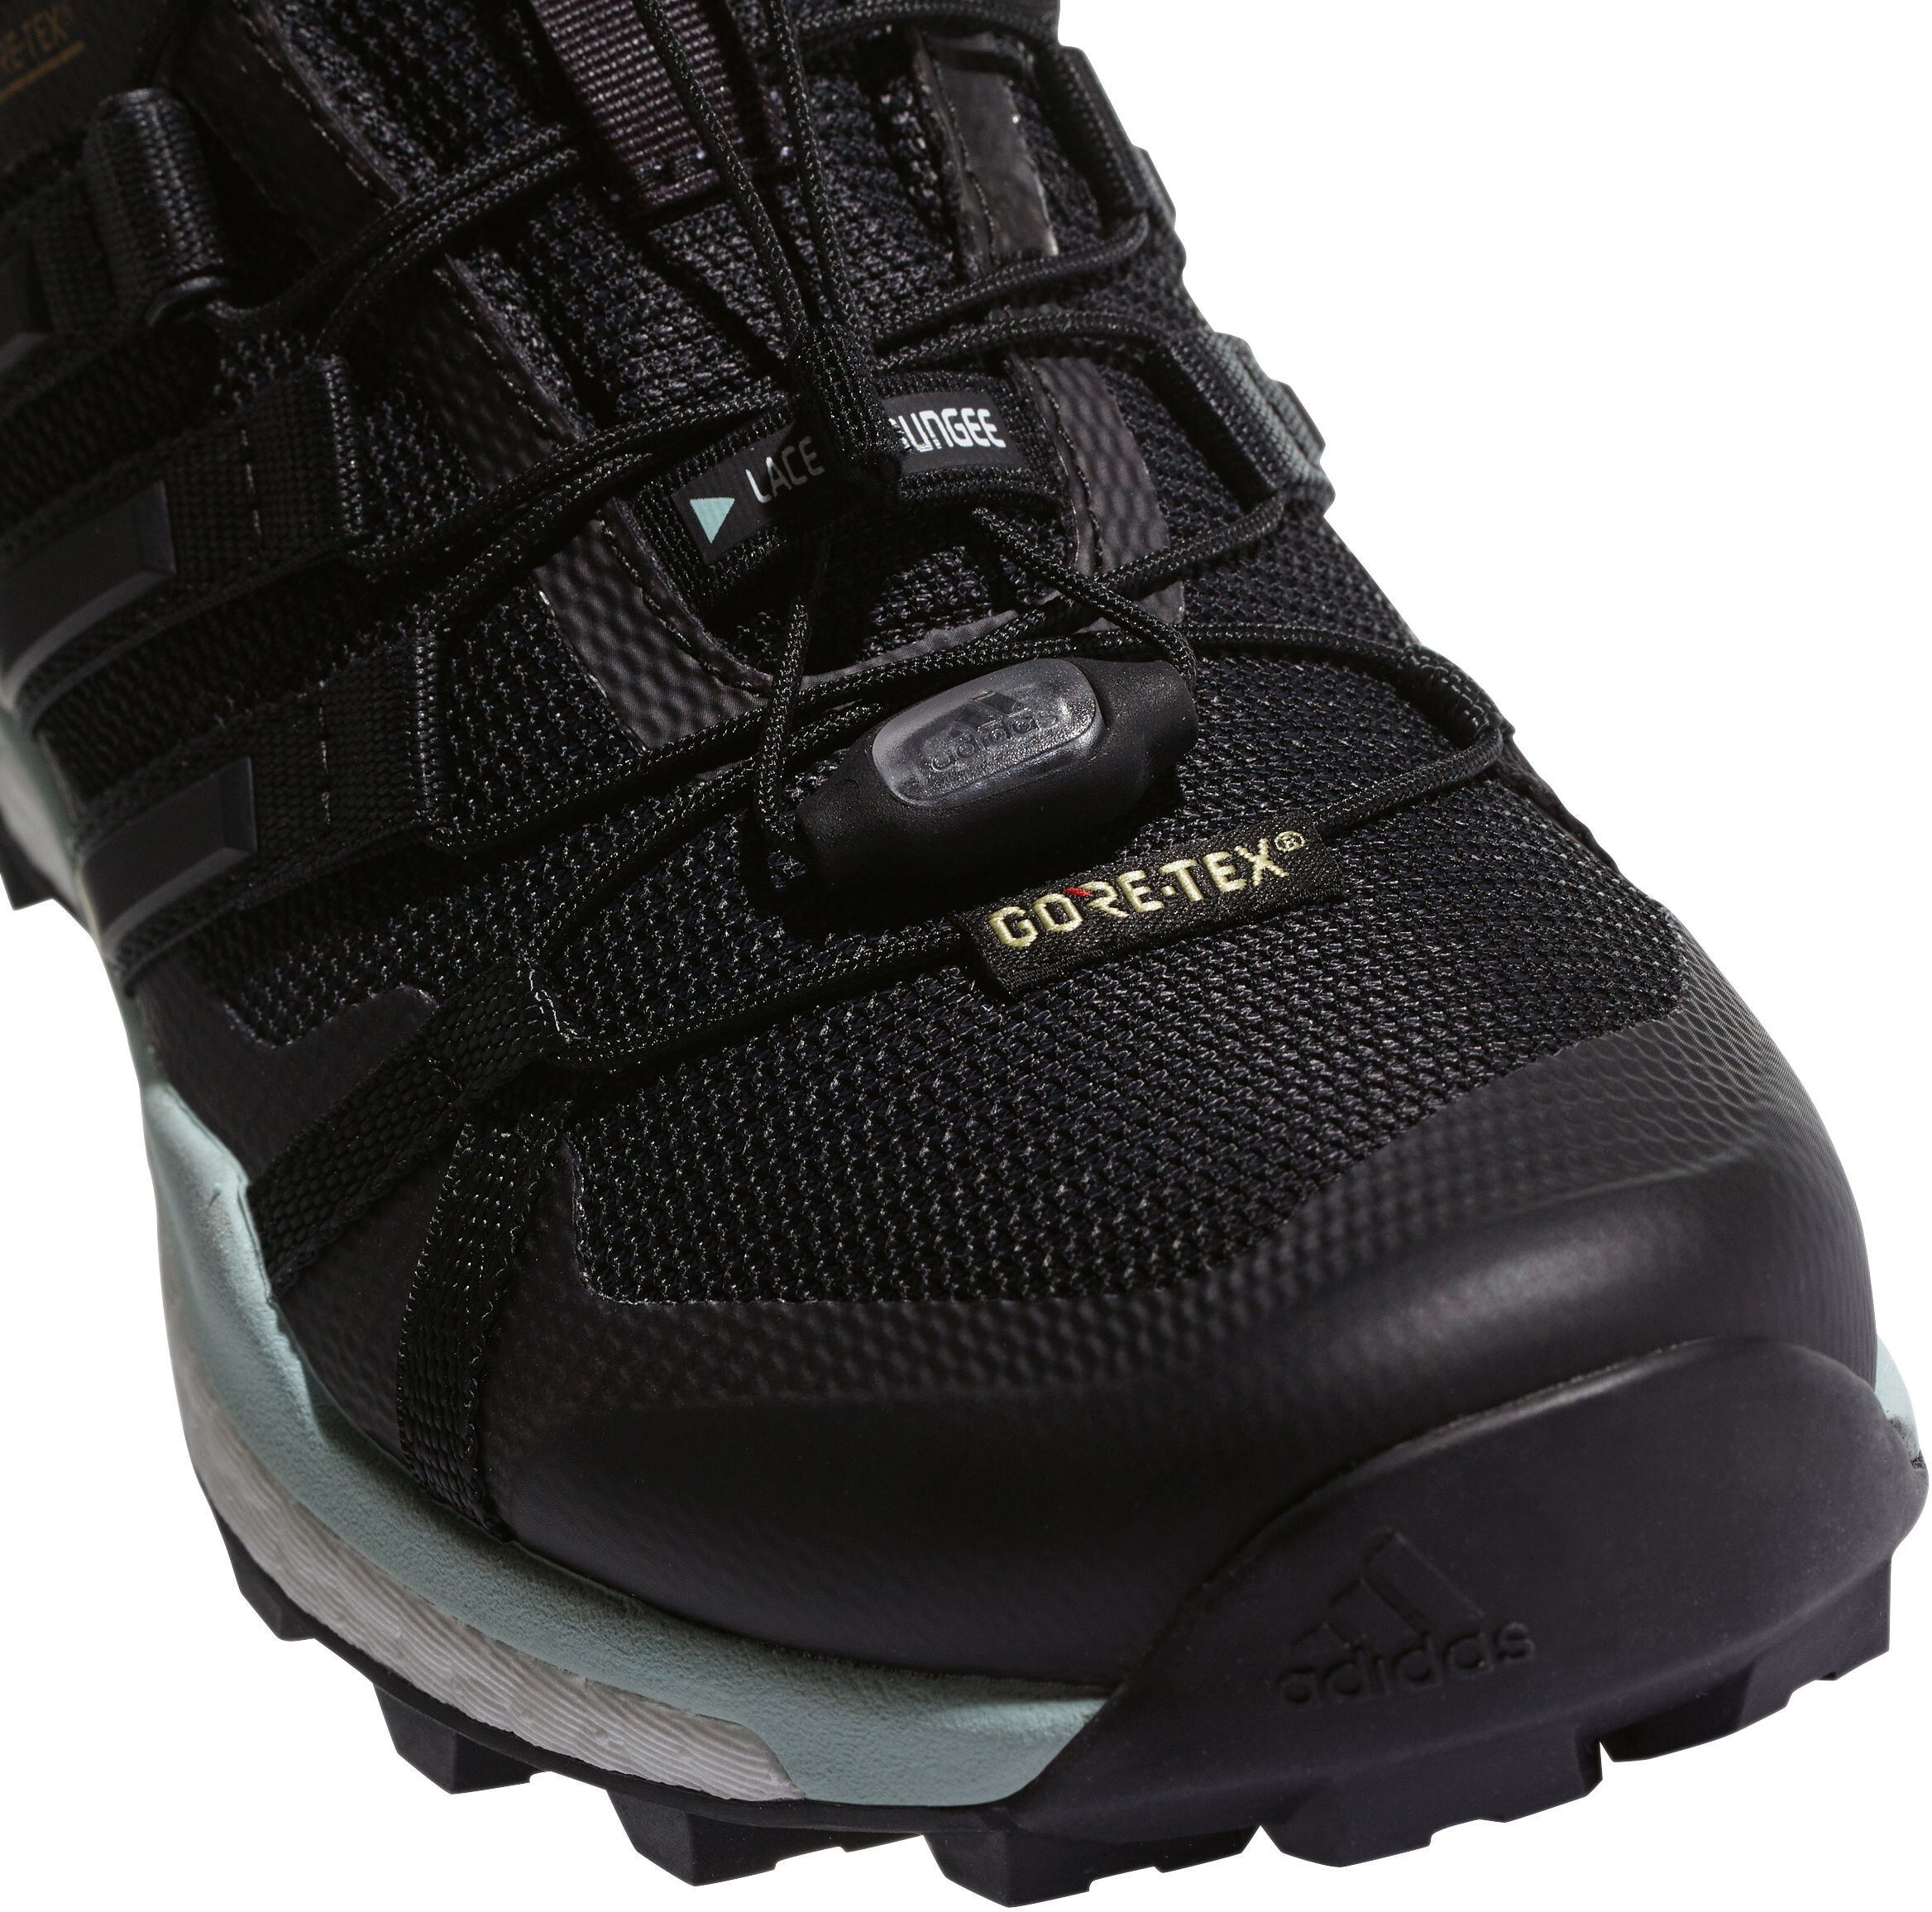 best service 70bae 86354 adidas TERREX Skychaser GT - Zapatillas running Mujer - negro